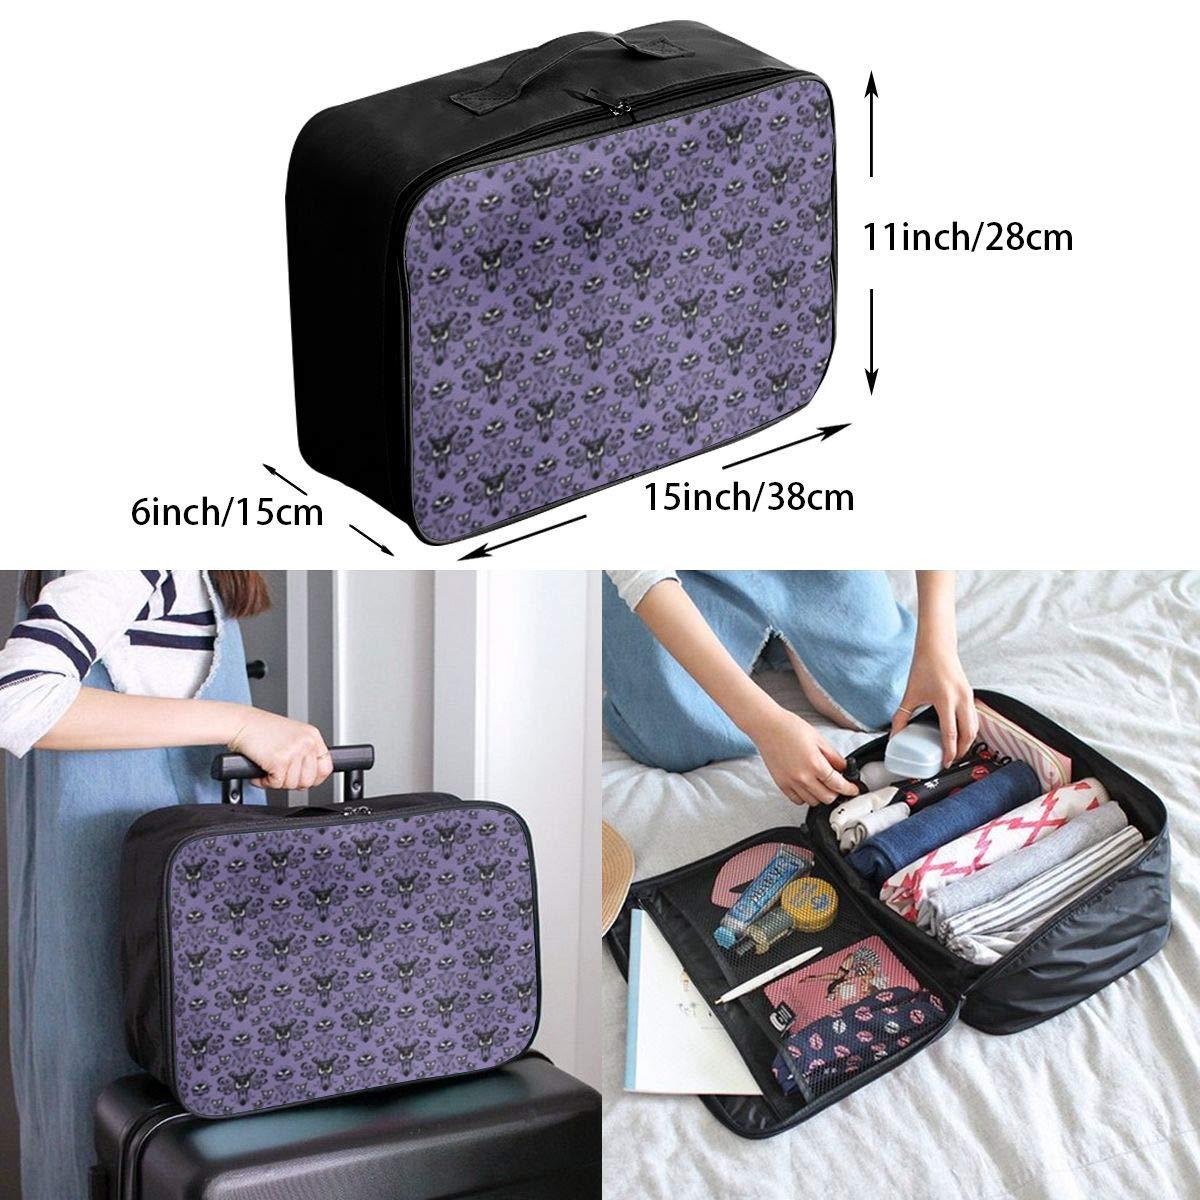 ADGAI Haunted Mansion Canvas Travel Weekender Bag,Fashion Custom Lightweight Large Capacity Portable Luggage Bag,Suitcase Trolley Bag